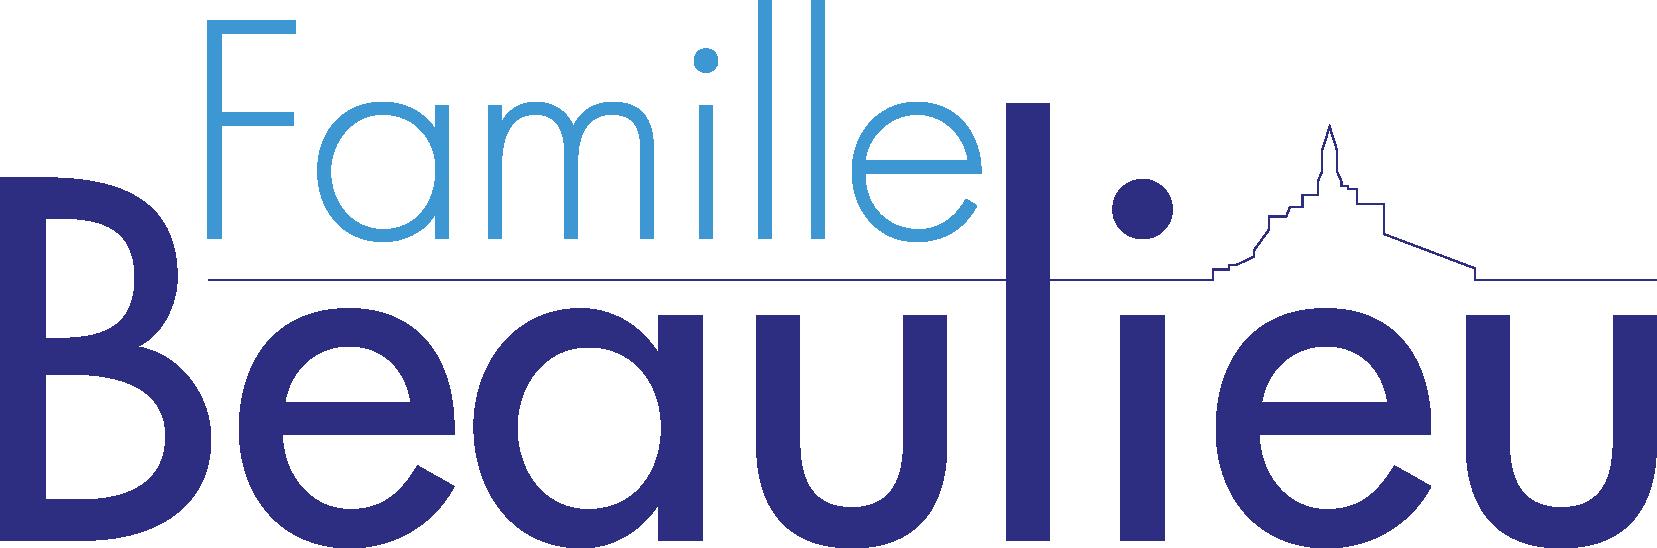 Famille Beaulieu - logo